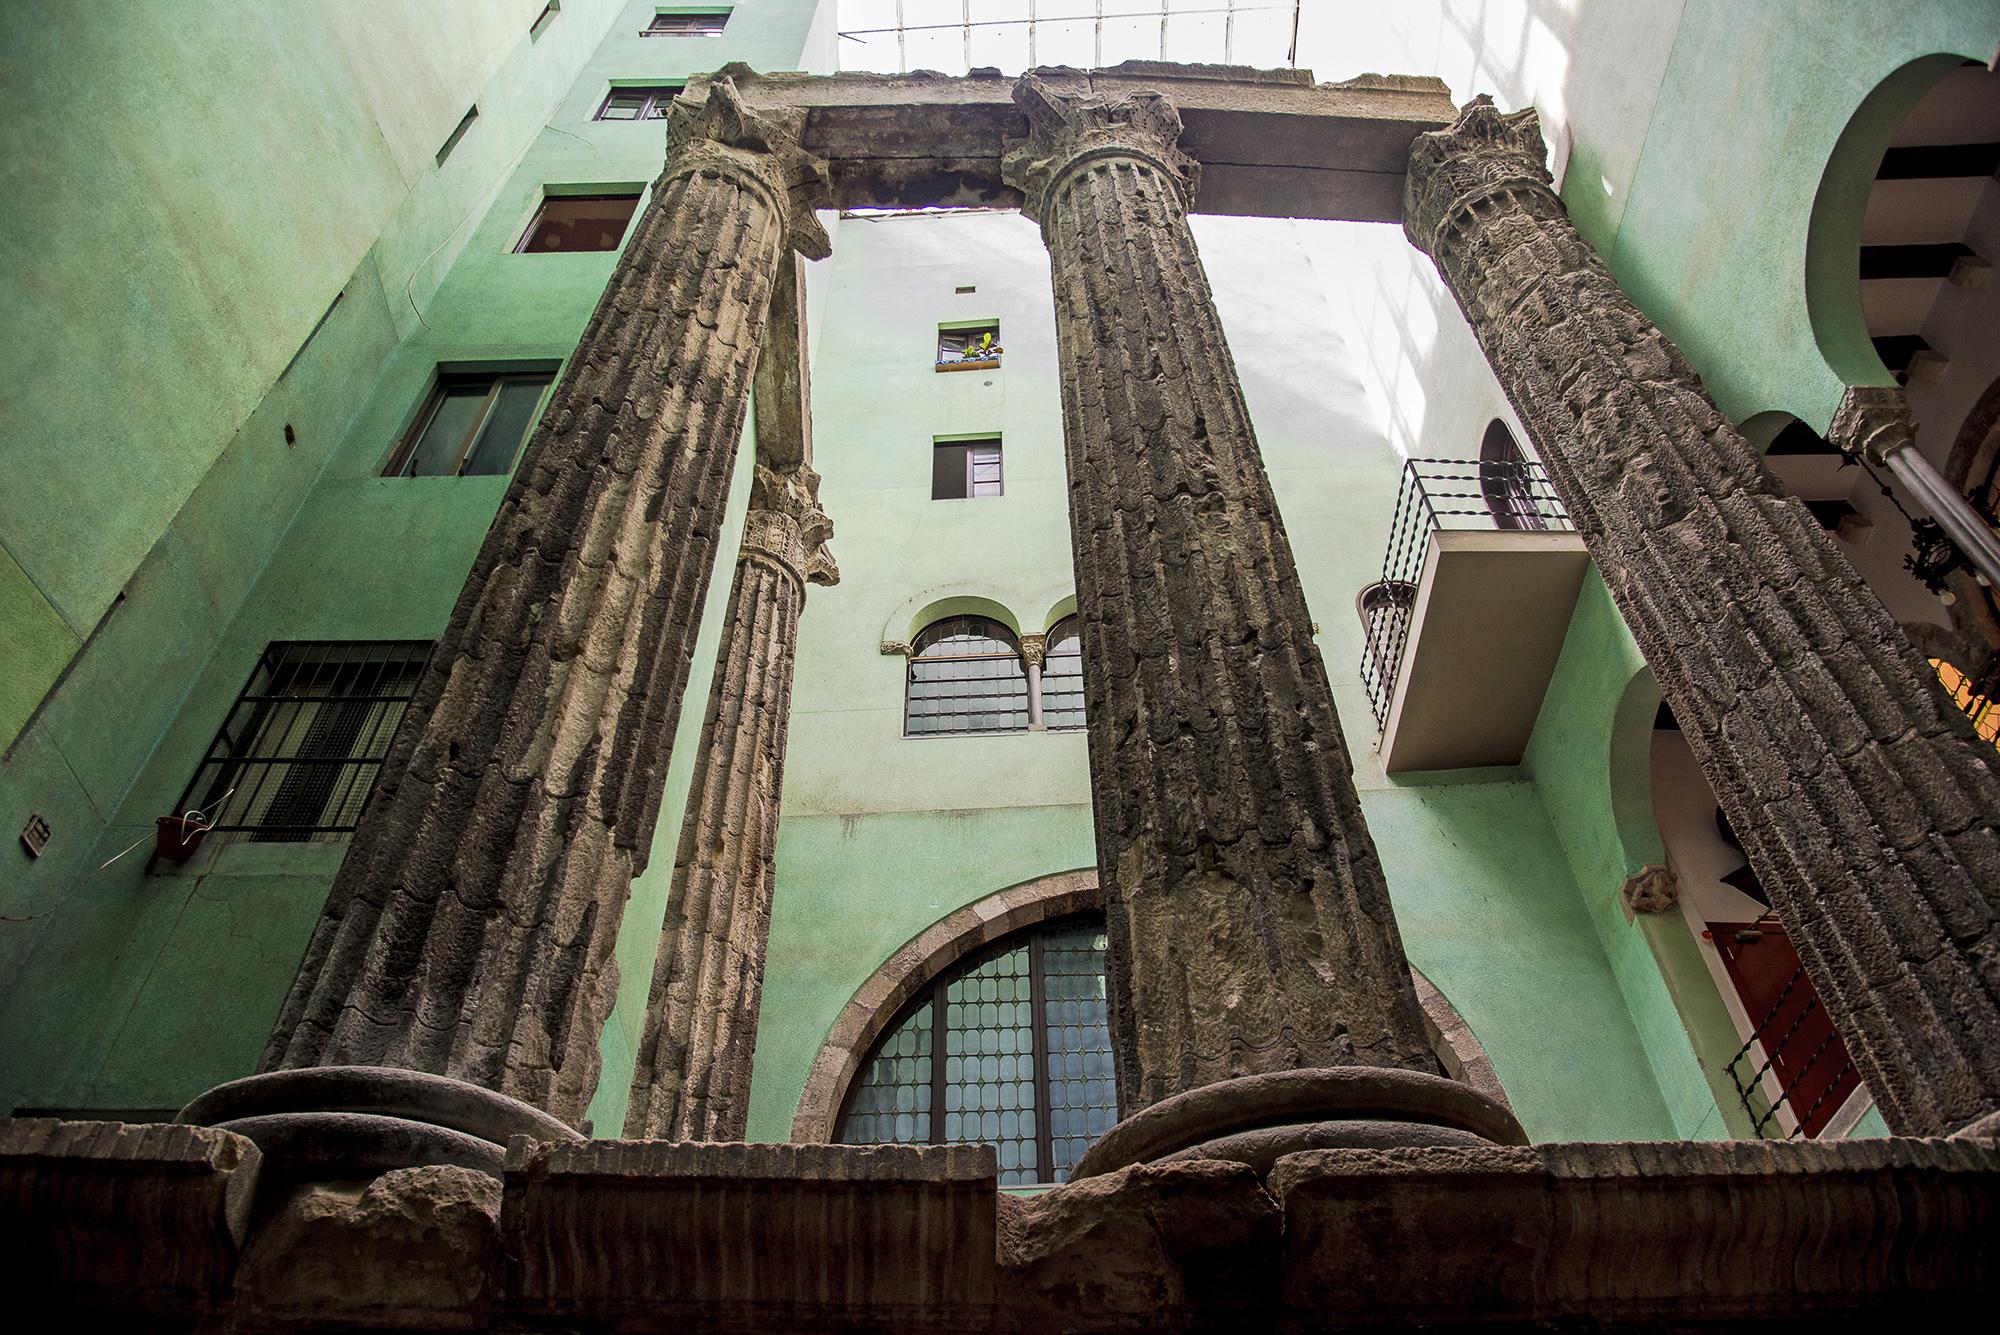 Barcelona-Delphine-006-aperture-tours.jpg